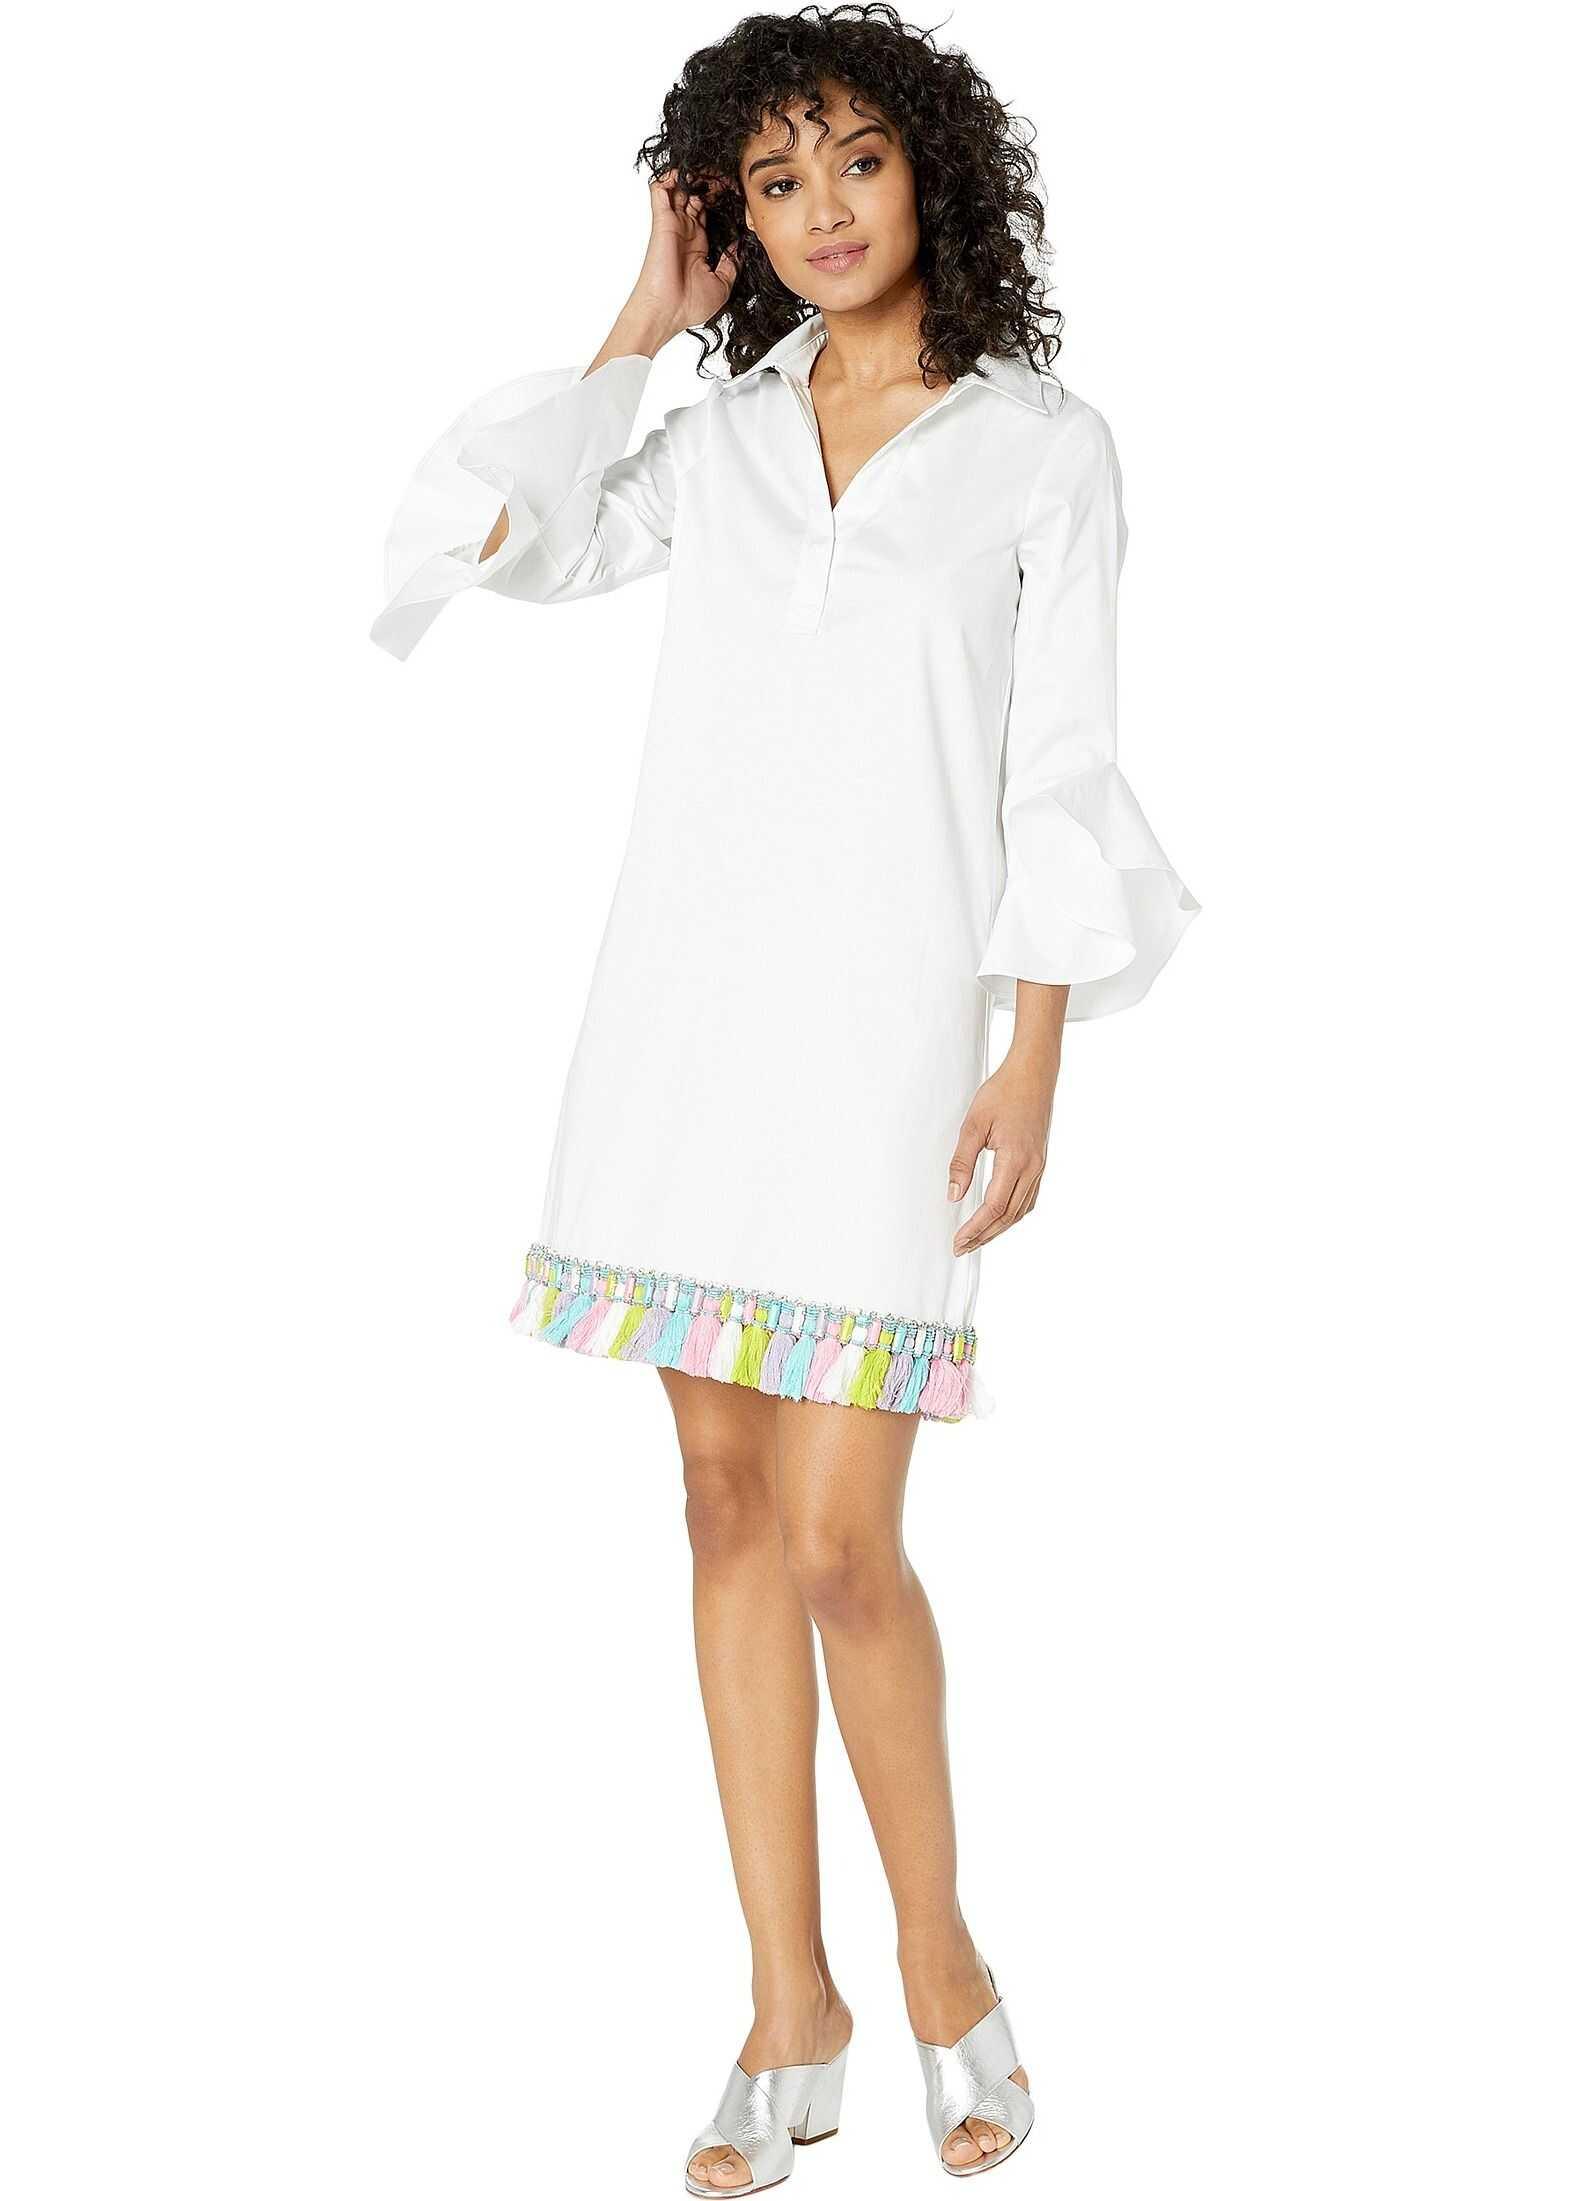 Badgley Mischka Tassel Trim Hem Dress White Multi